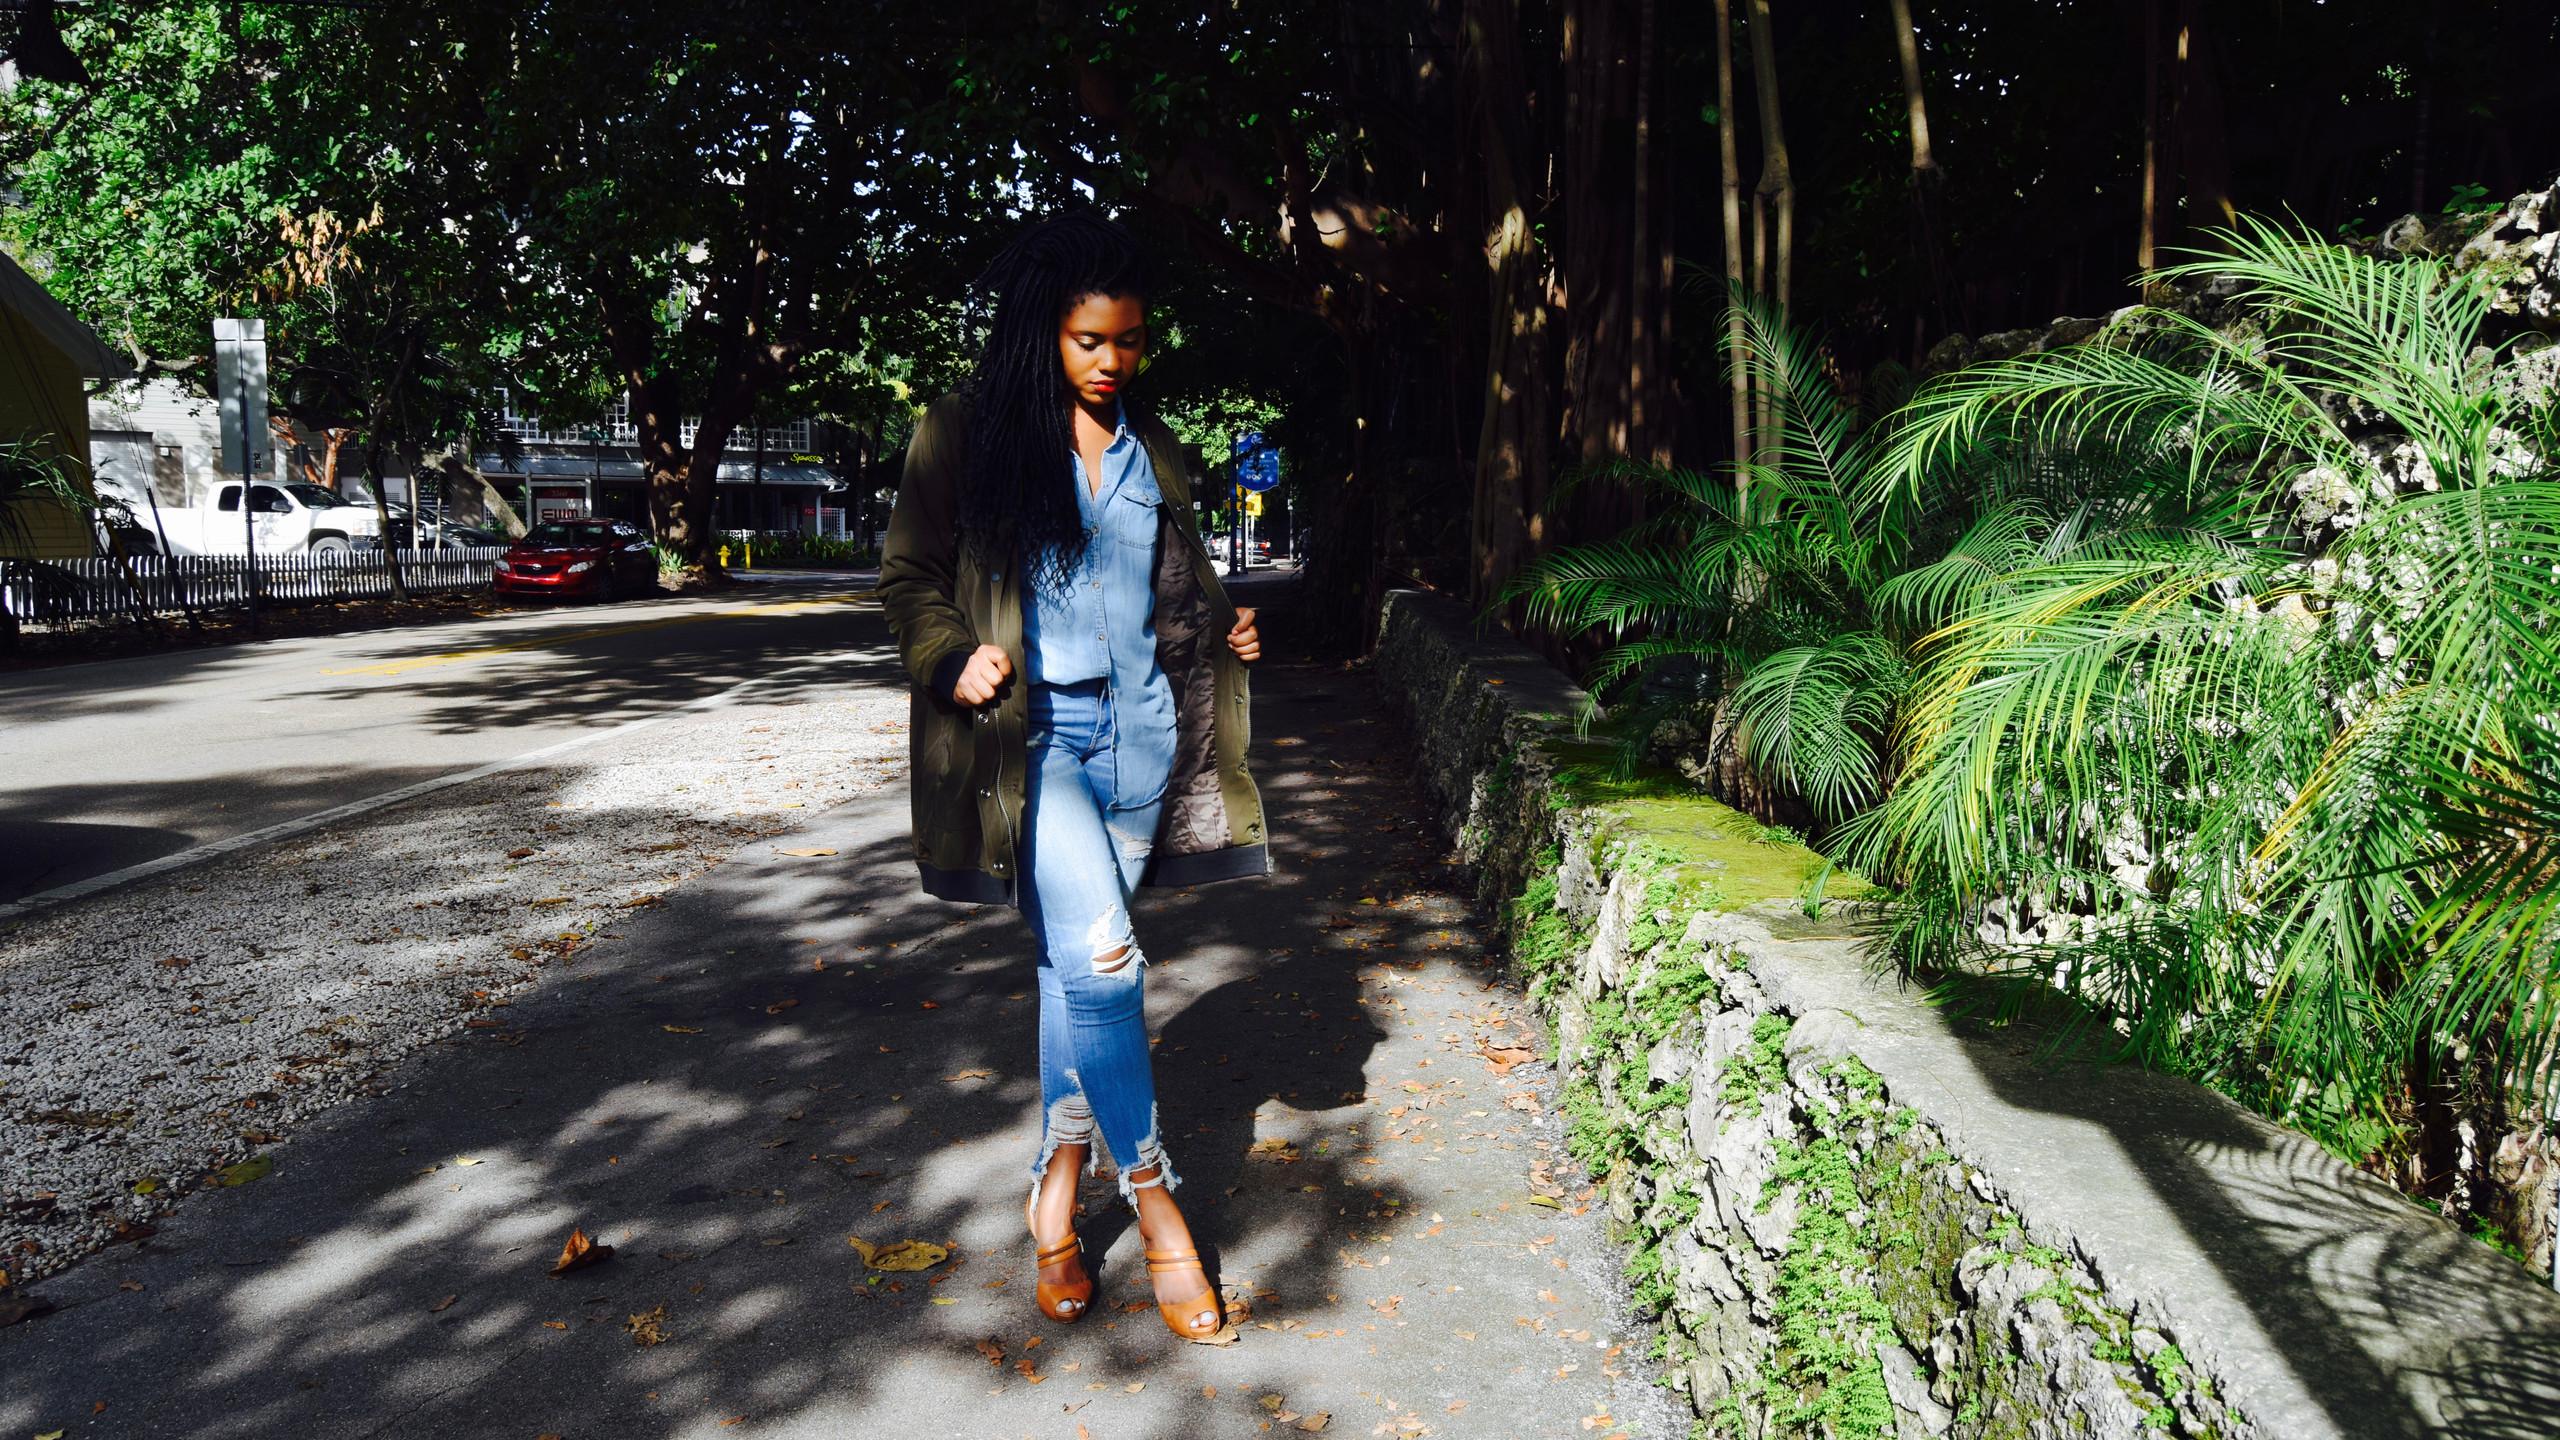 Location: Coconut Grove